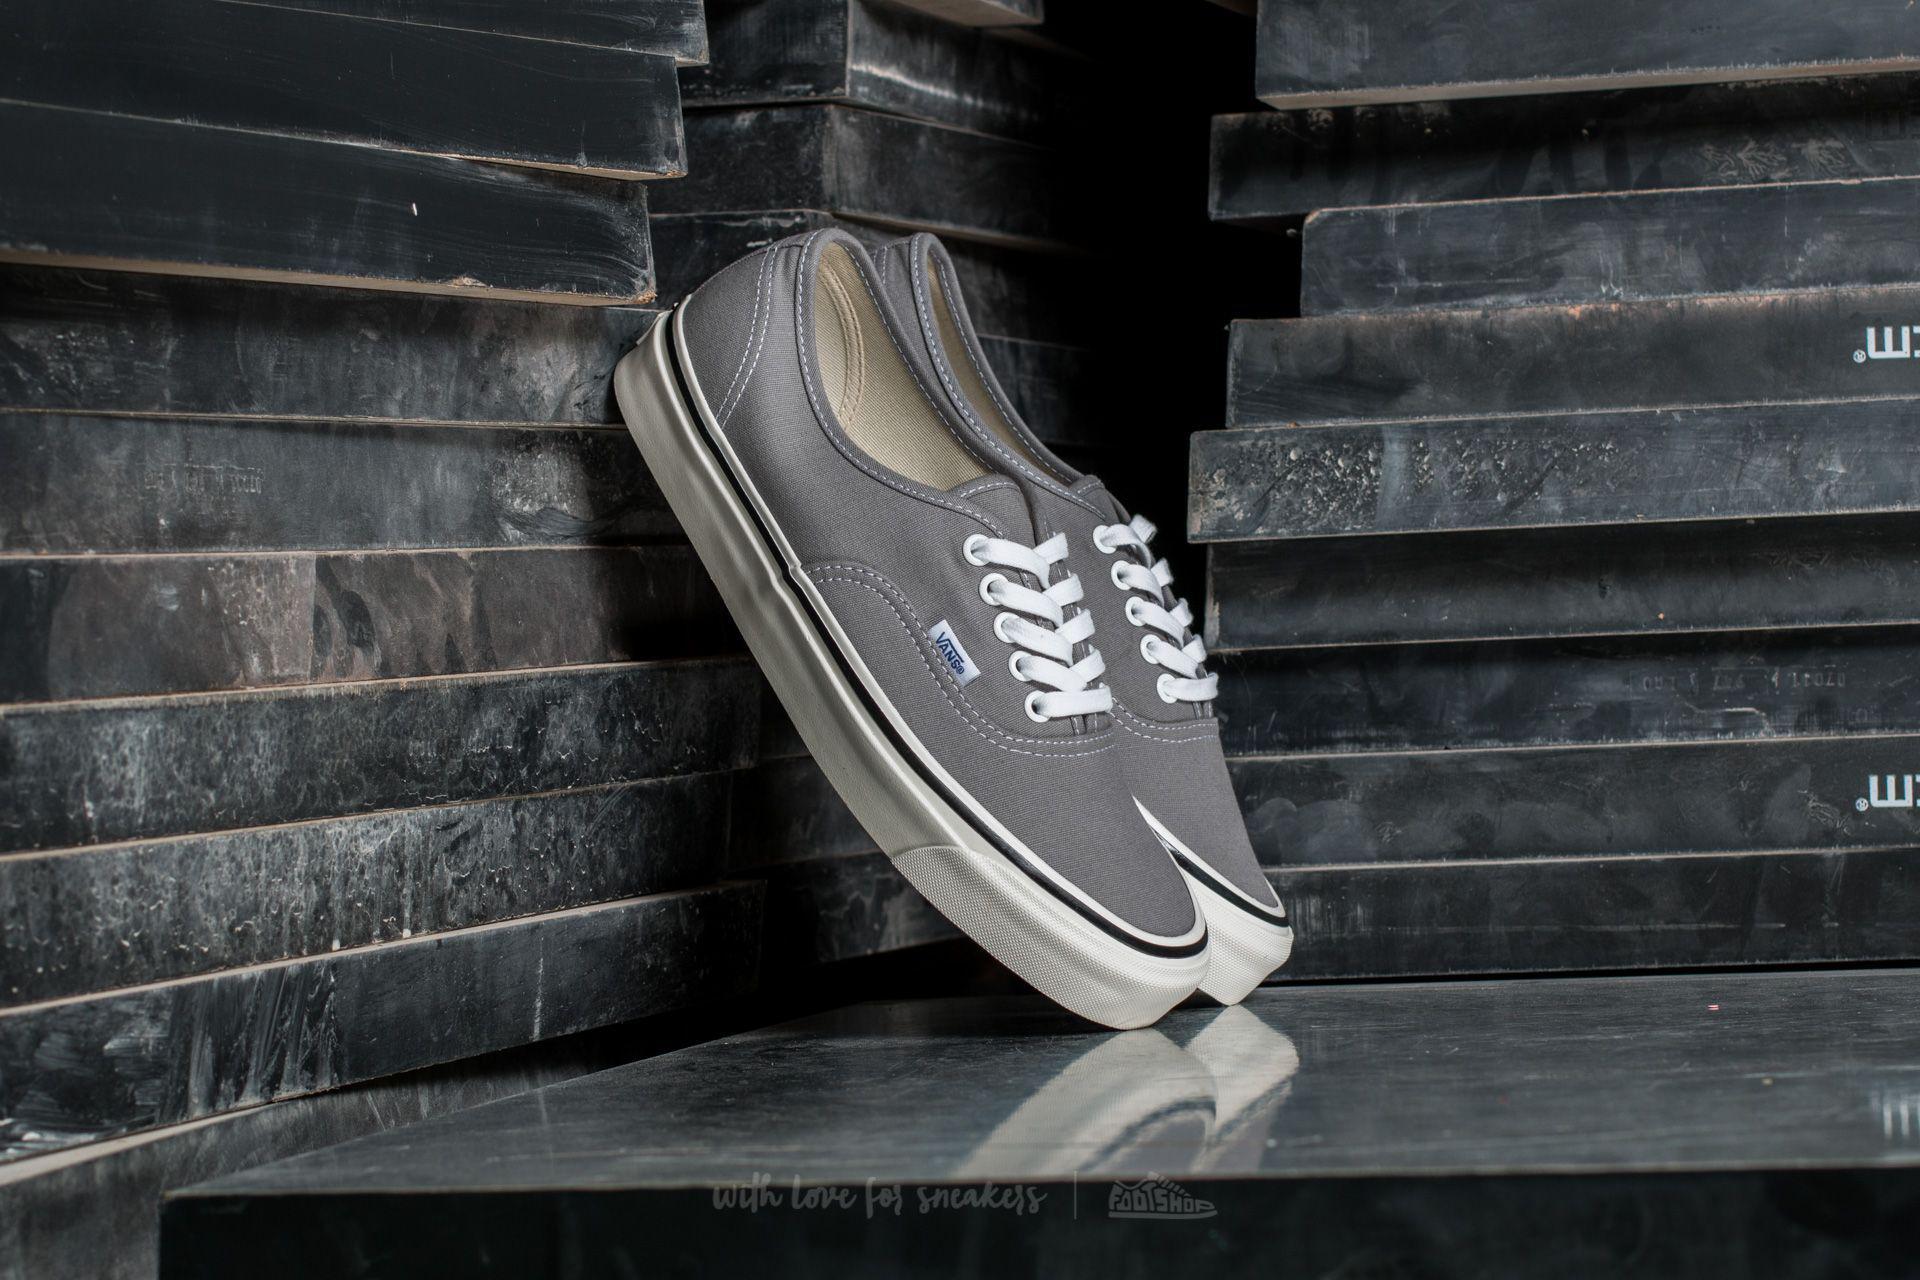 c6d80e62032 Lyst - Vans Authentic 44 Dx (anaheim Factory) Light Grey in Gray for Men